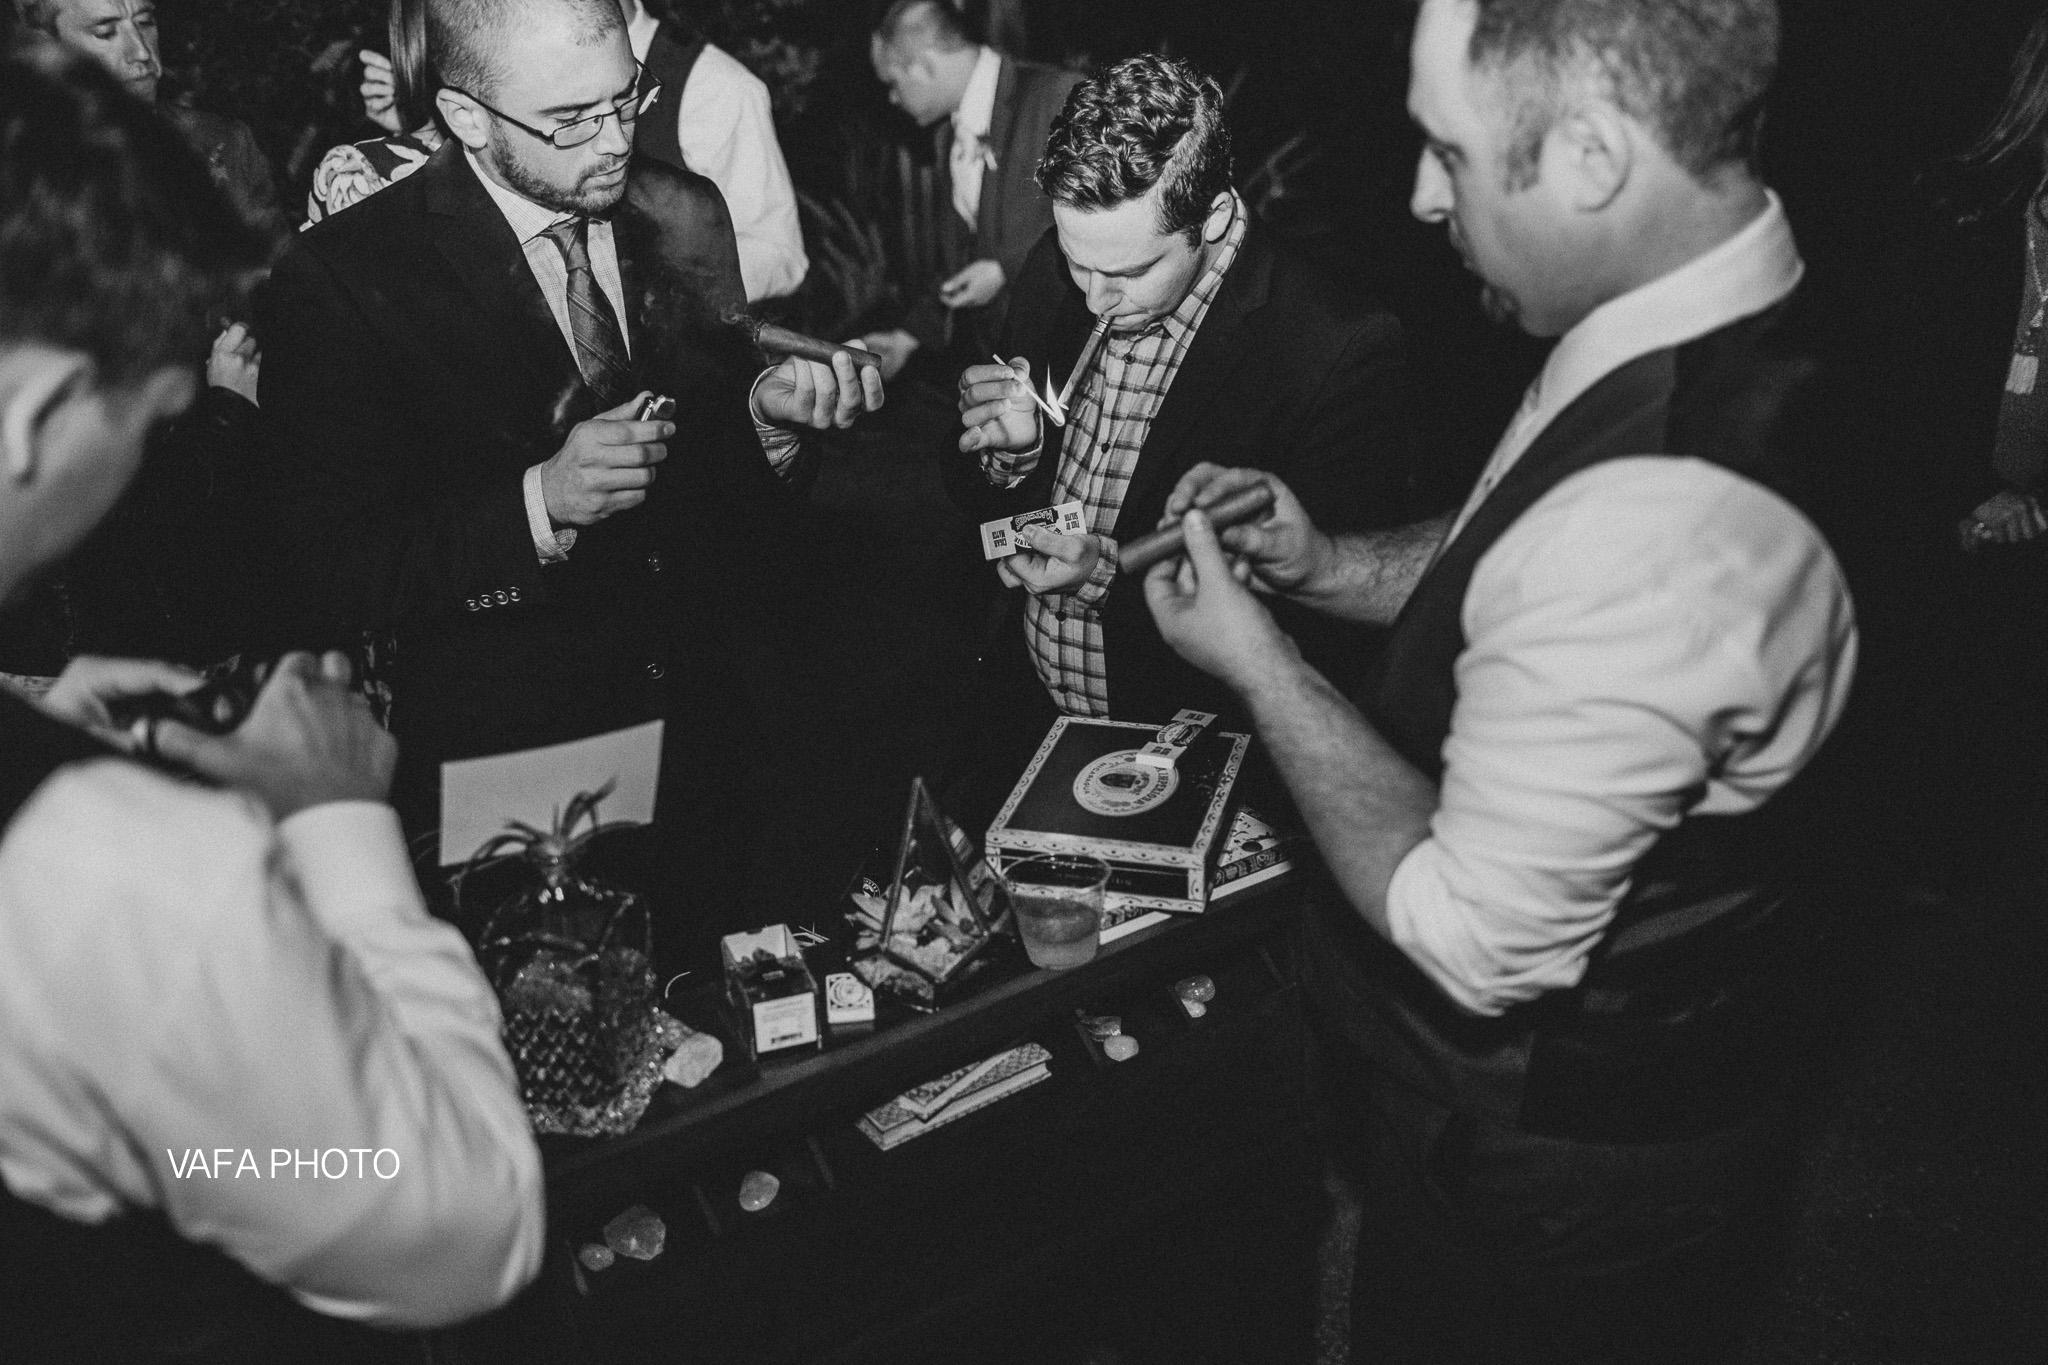 Leo-Carrillo-Ranch-Wedding-Lauren-Mike-Vafa-Photo-1110.jpg